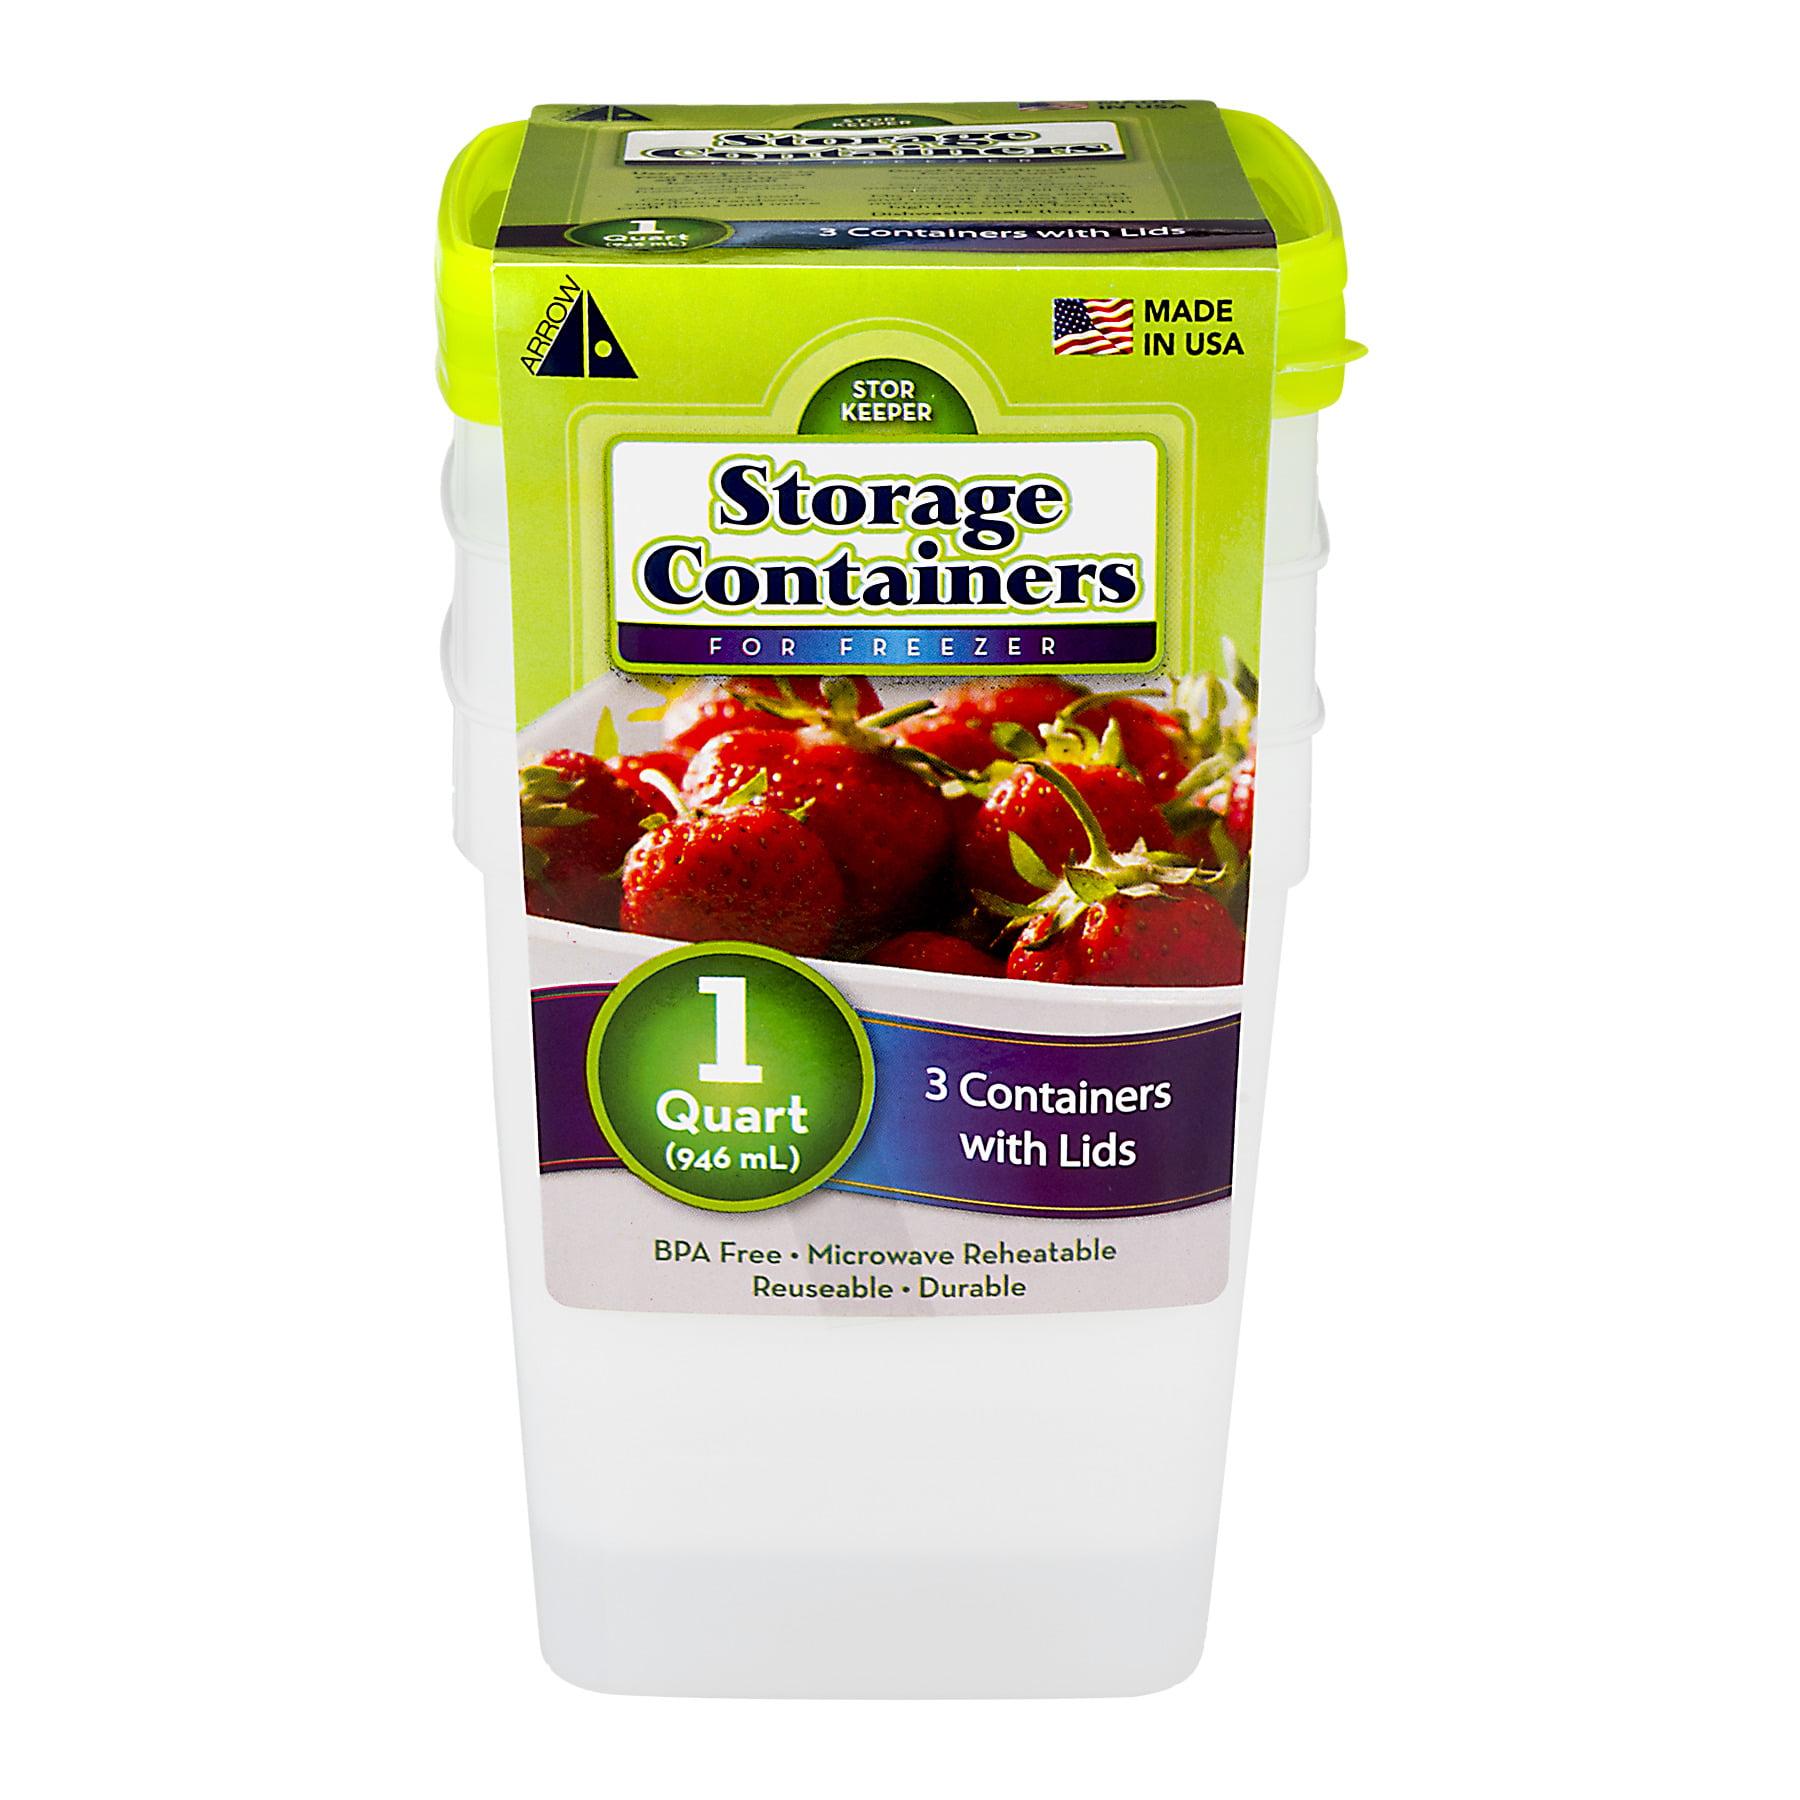 Arrow Storage Containers for Freezer (1 Quart) - 3 CT3.0 CT